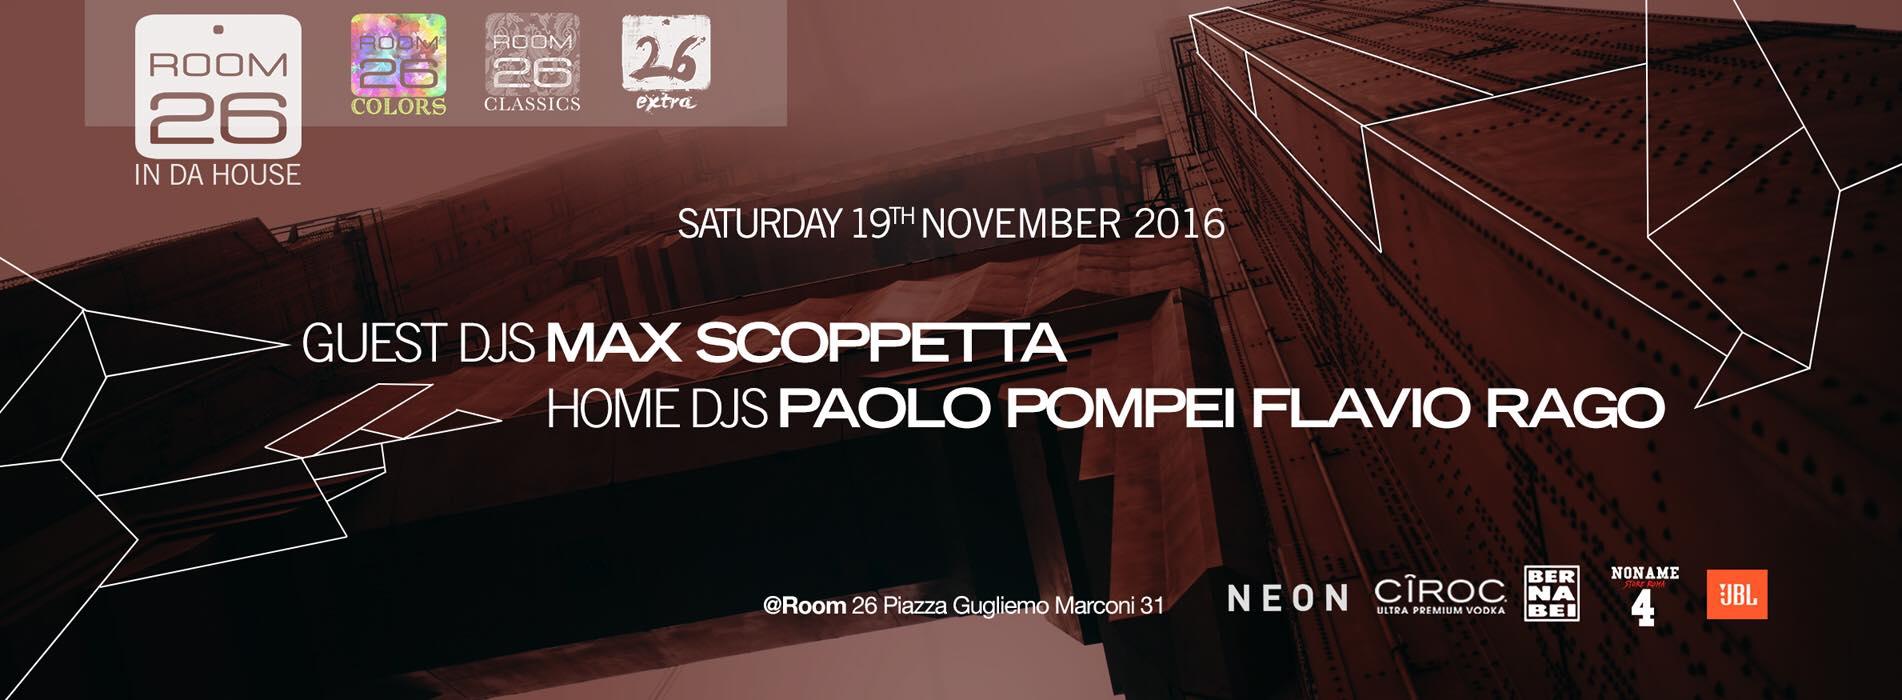 Room 26 Discoteca Eur sabato 19 novembre 2016